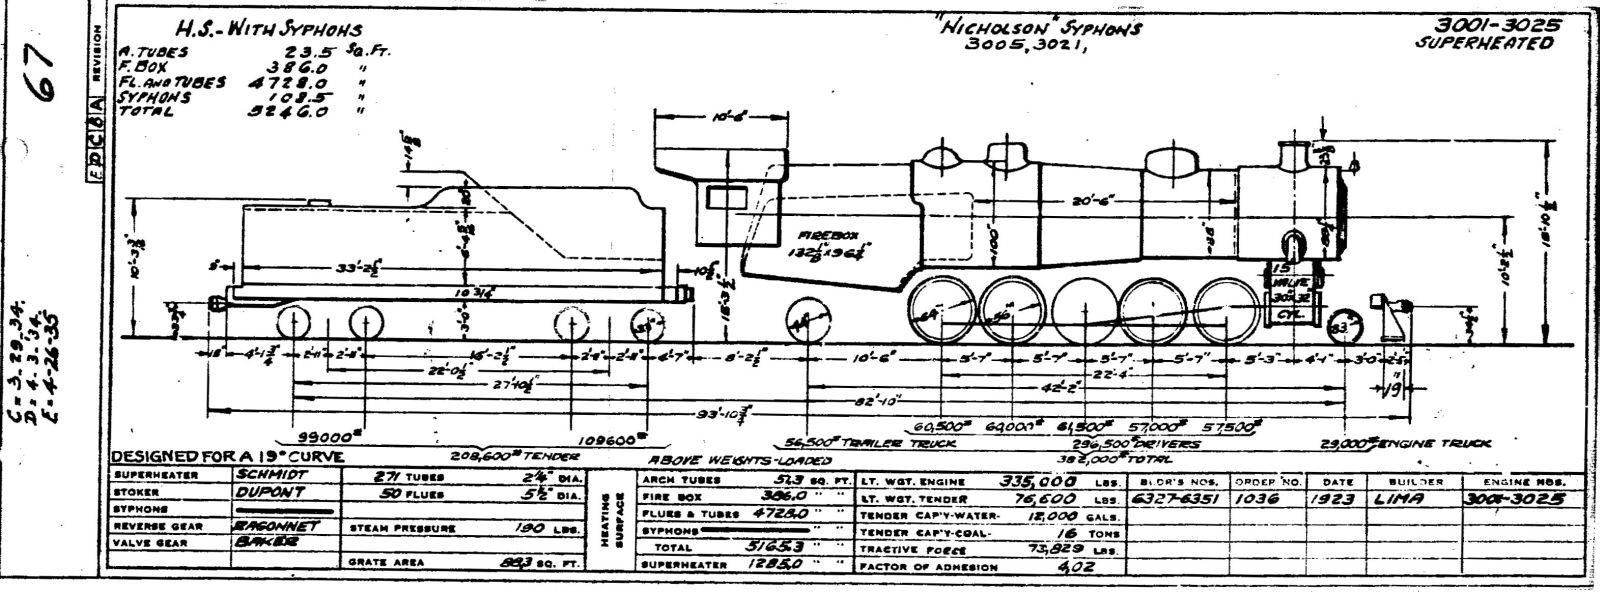 Illinois Central 1937 Locomotive Diagrams Diagram Of Steam Engine 50 3331 51 Locomotives 33303334 52 3333 53 3332 54 3335 3336 55 3320